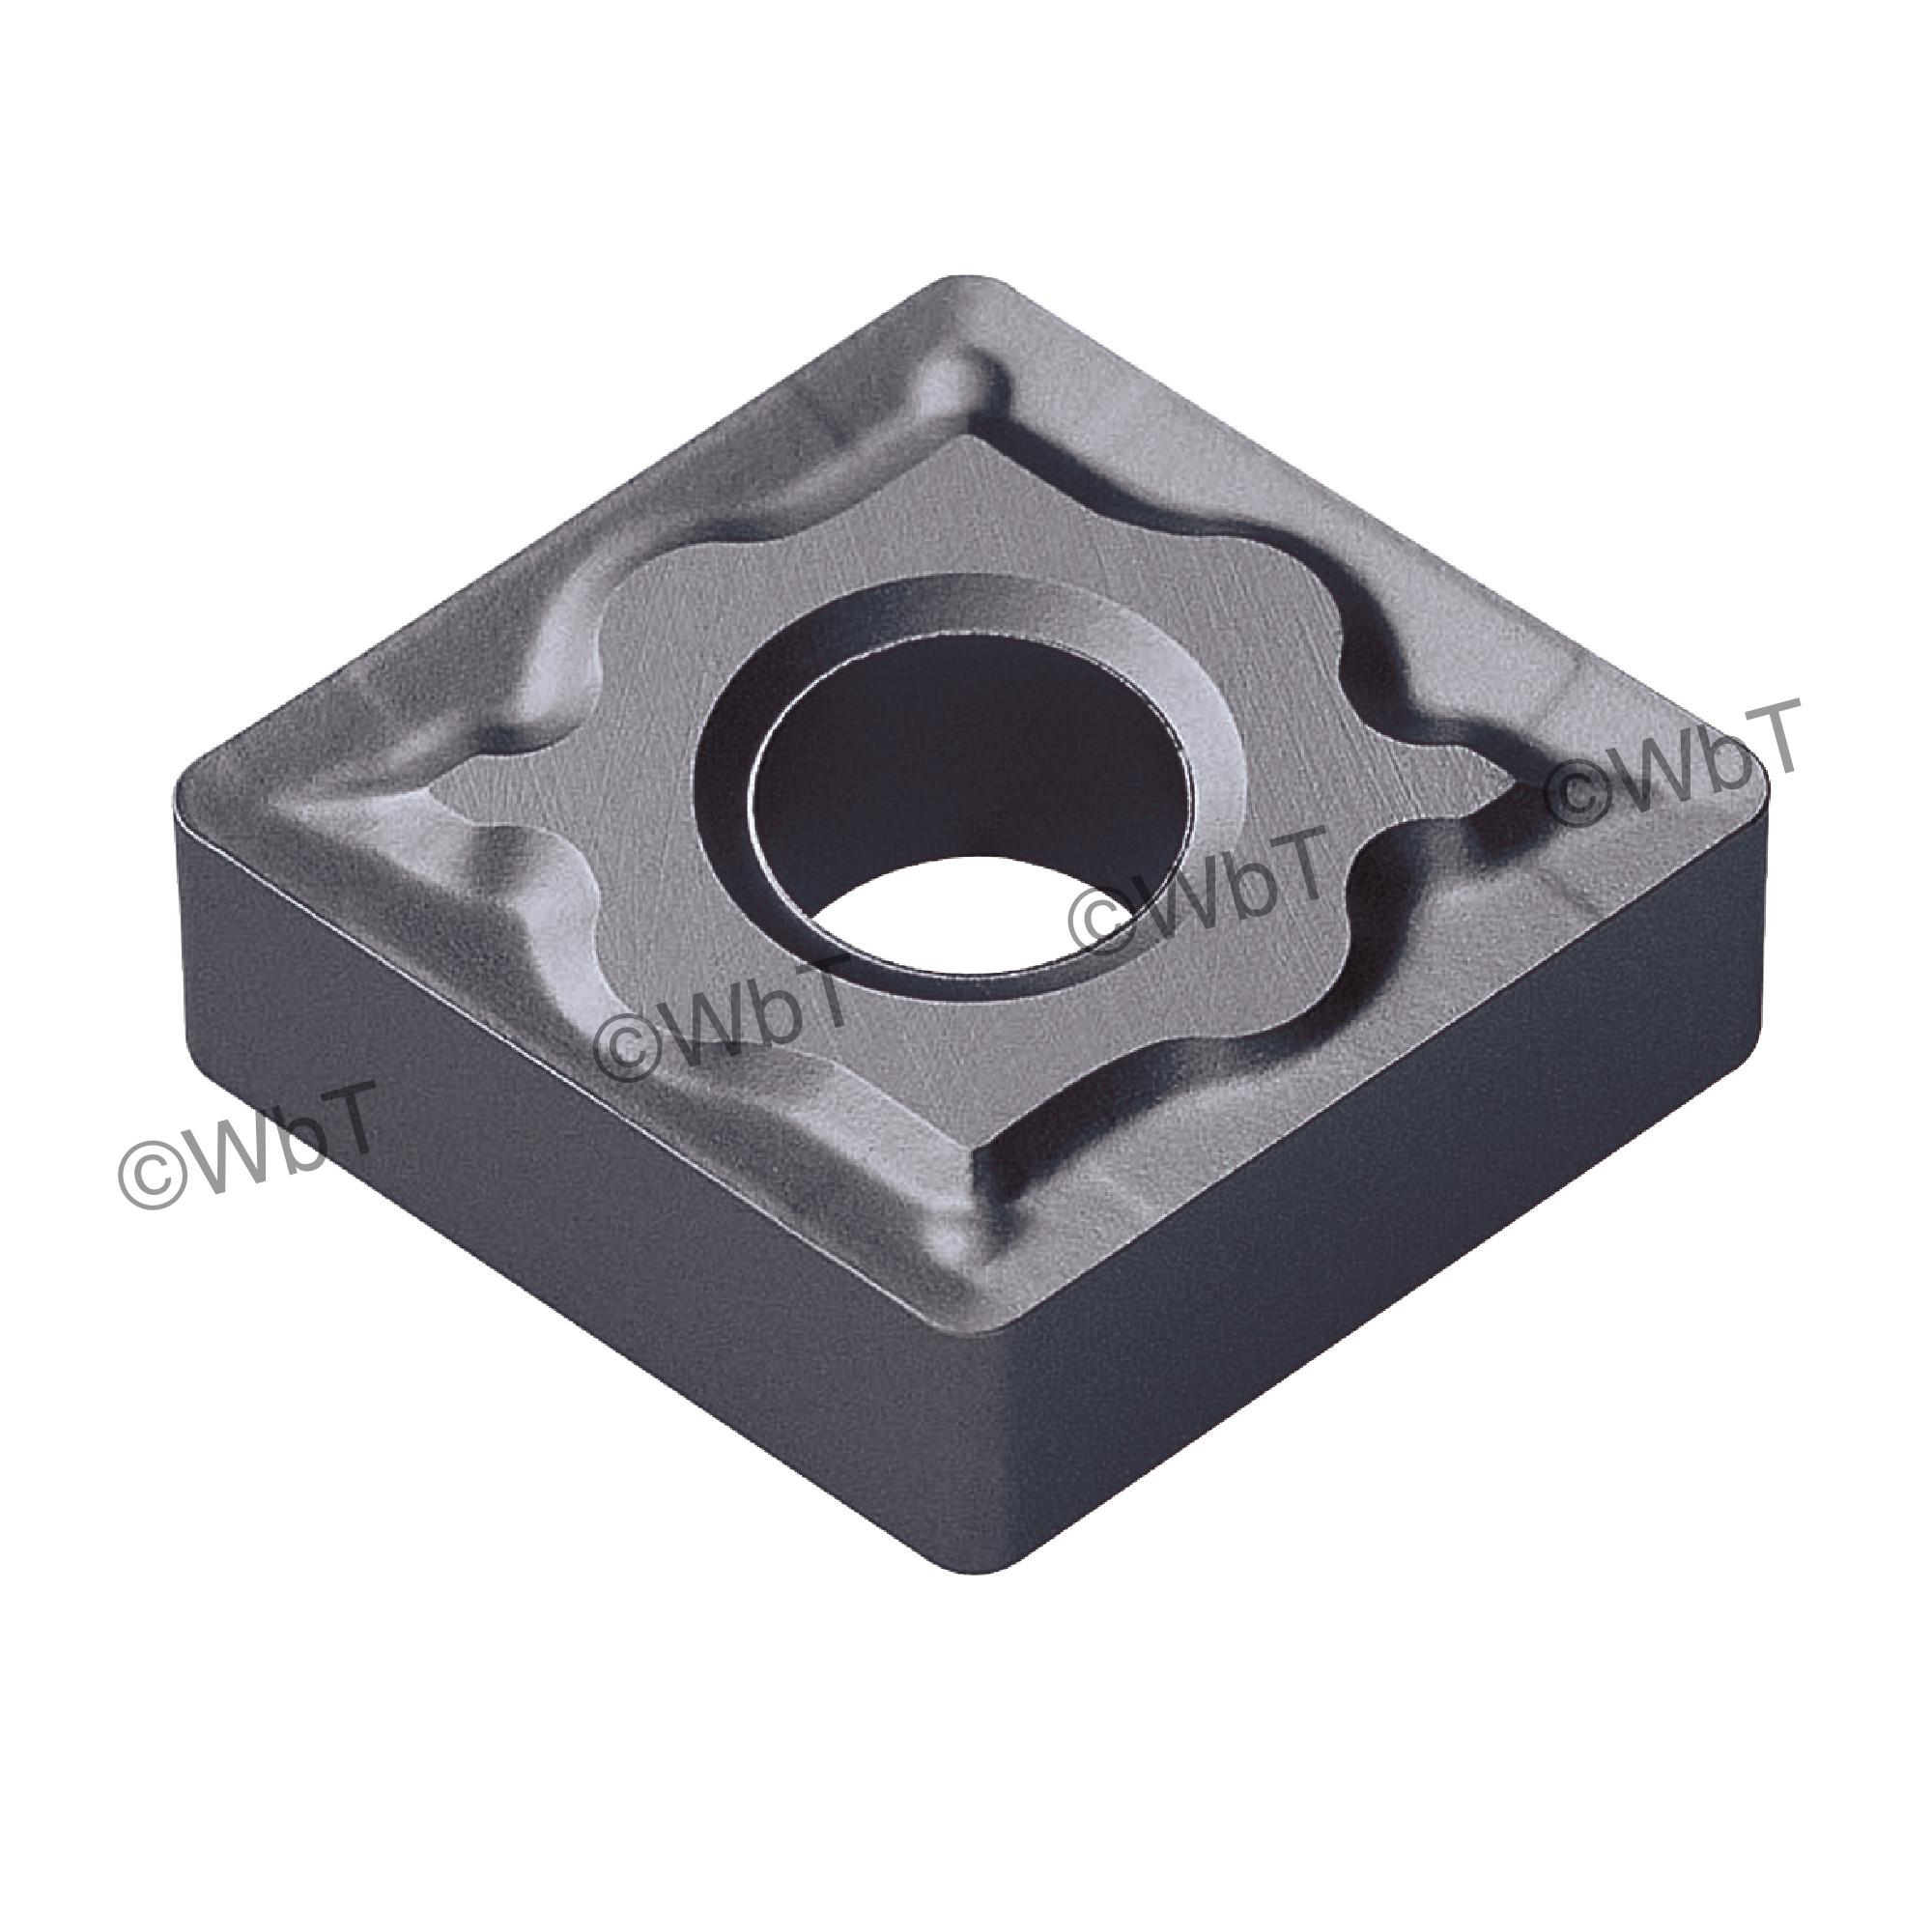 AKUMA - CNMG431-MRM1 PT10S - 80° Diamond / Indexable Carbide Turning Insert